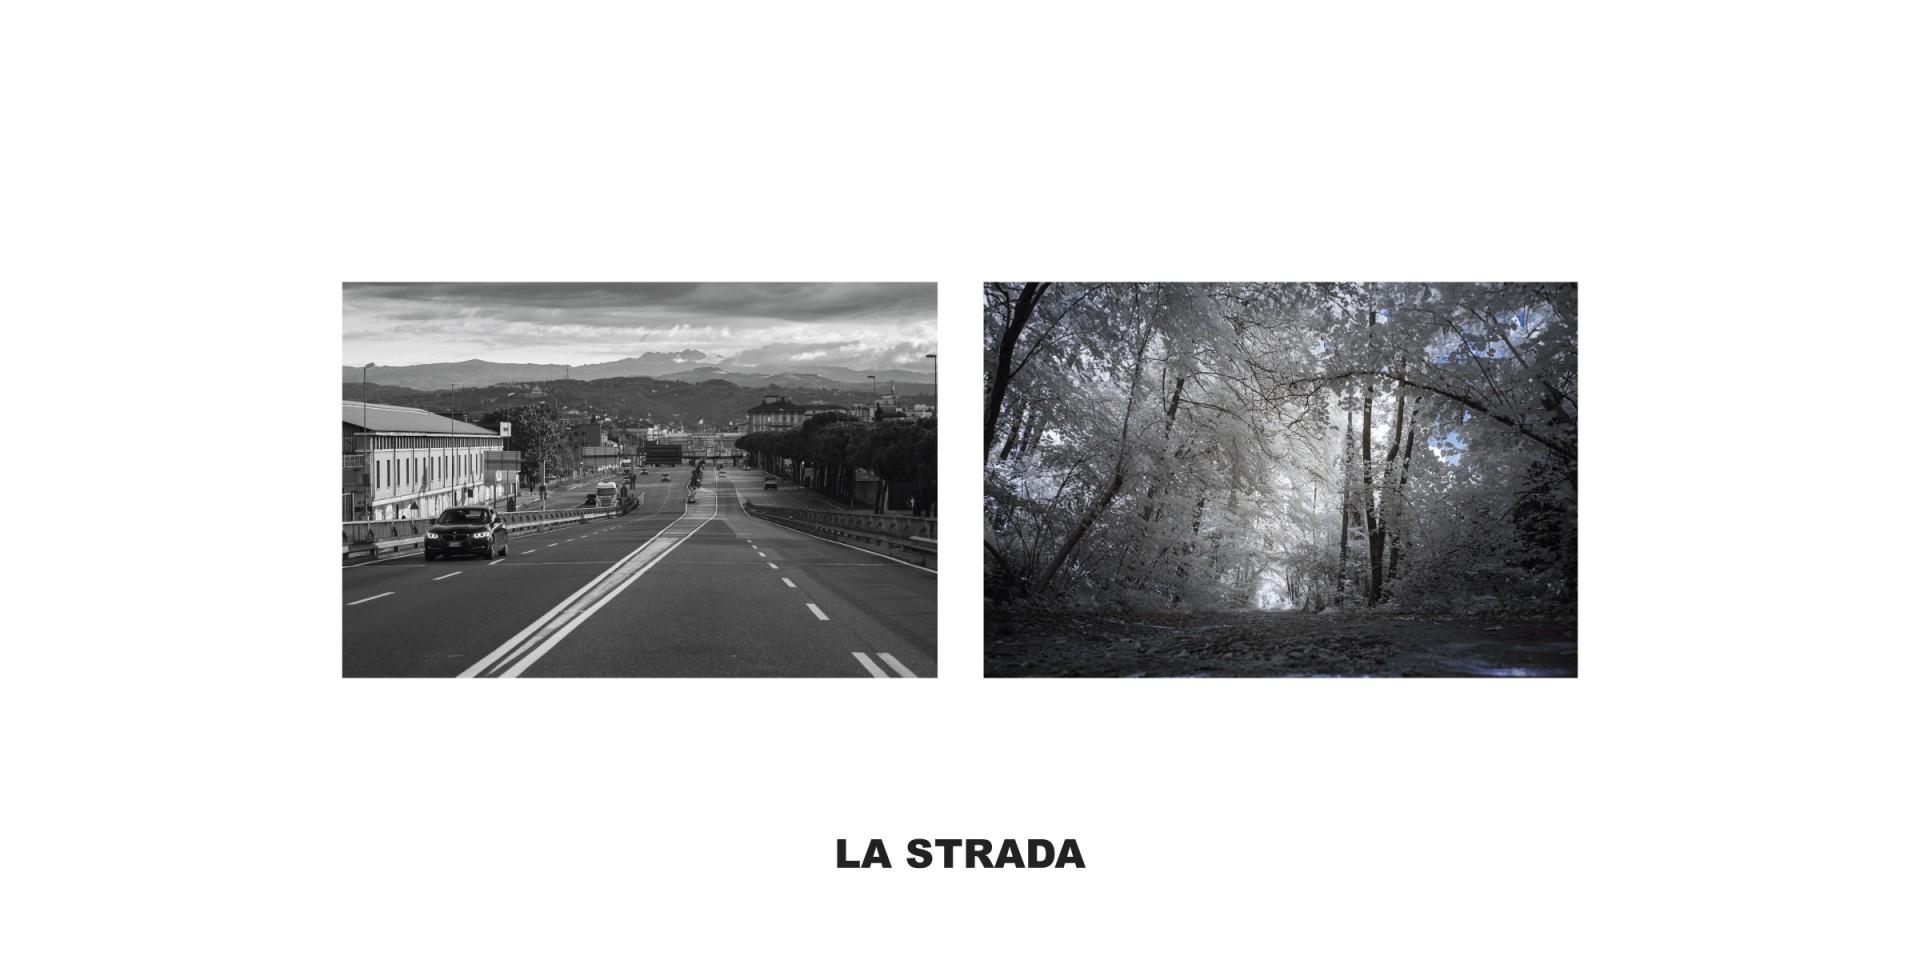 01-slide-la-strada-2.jpg